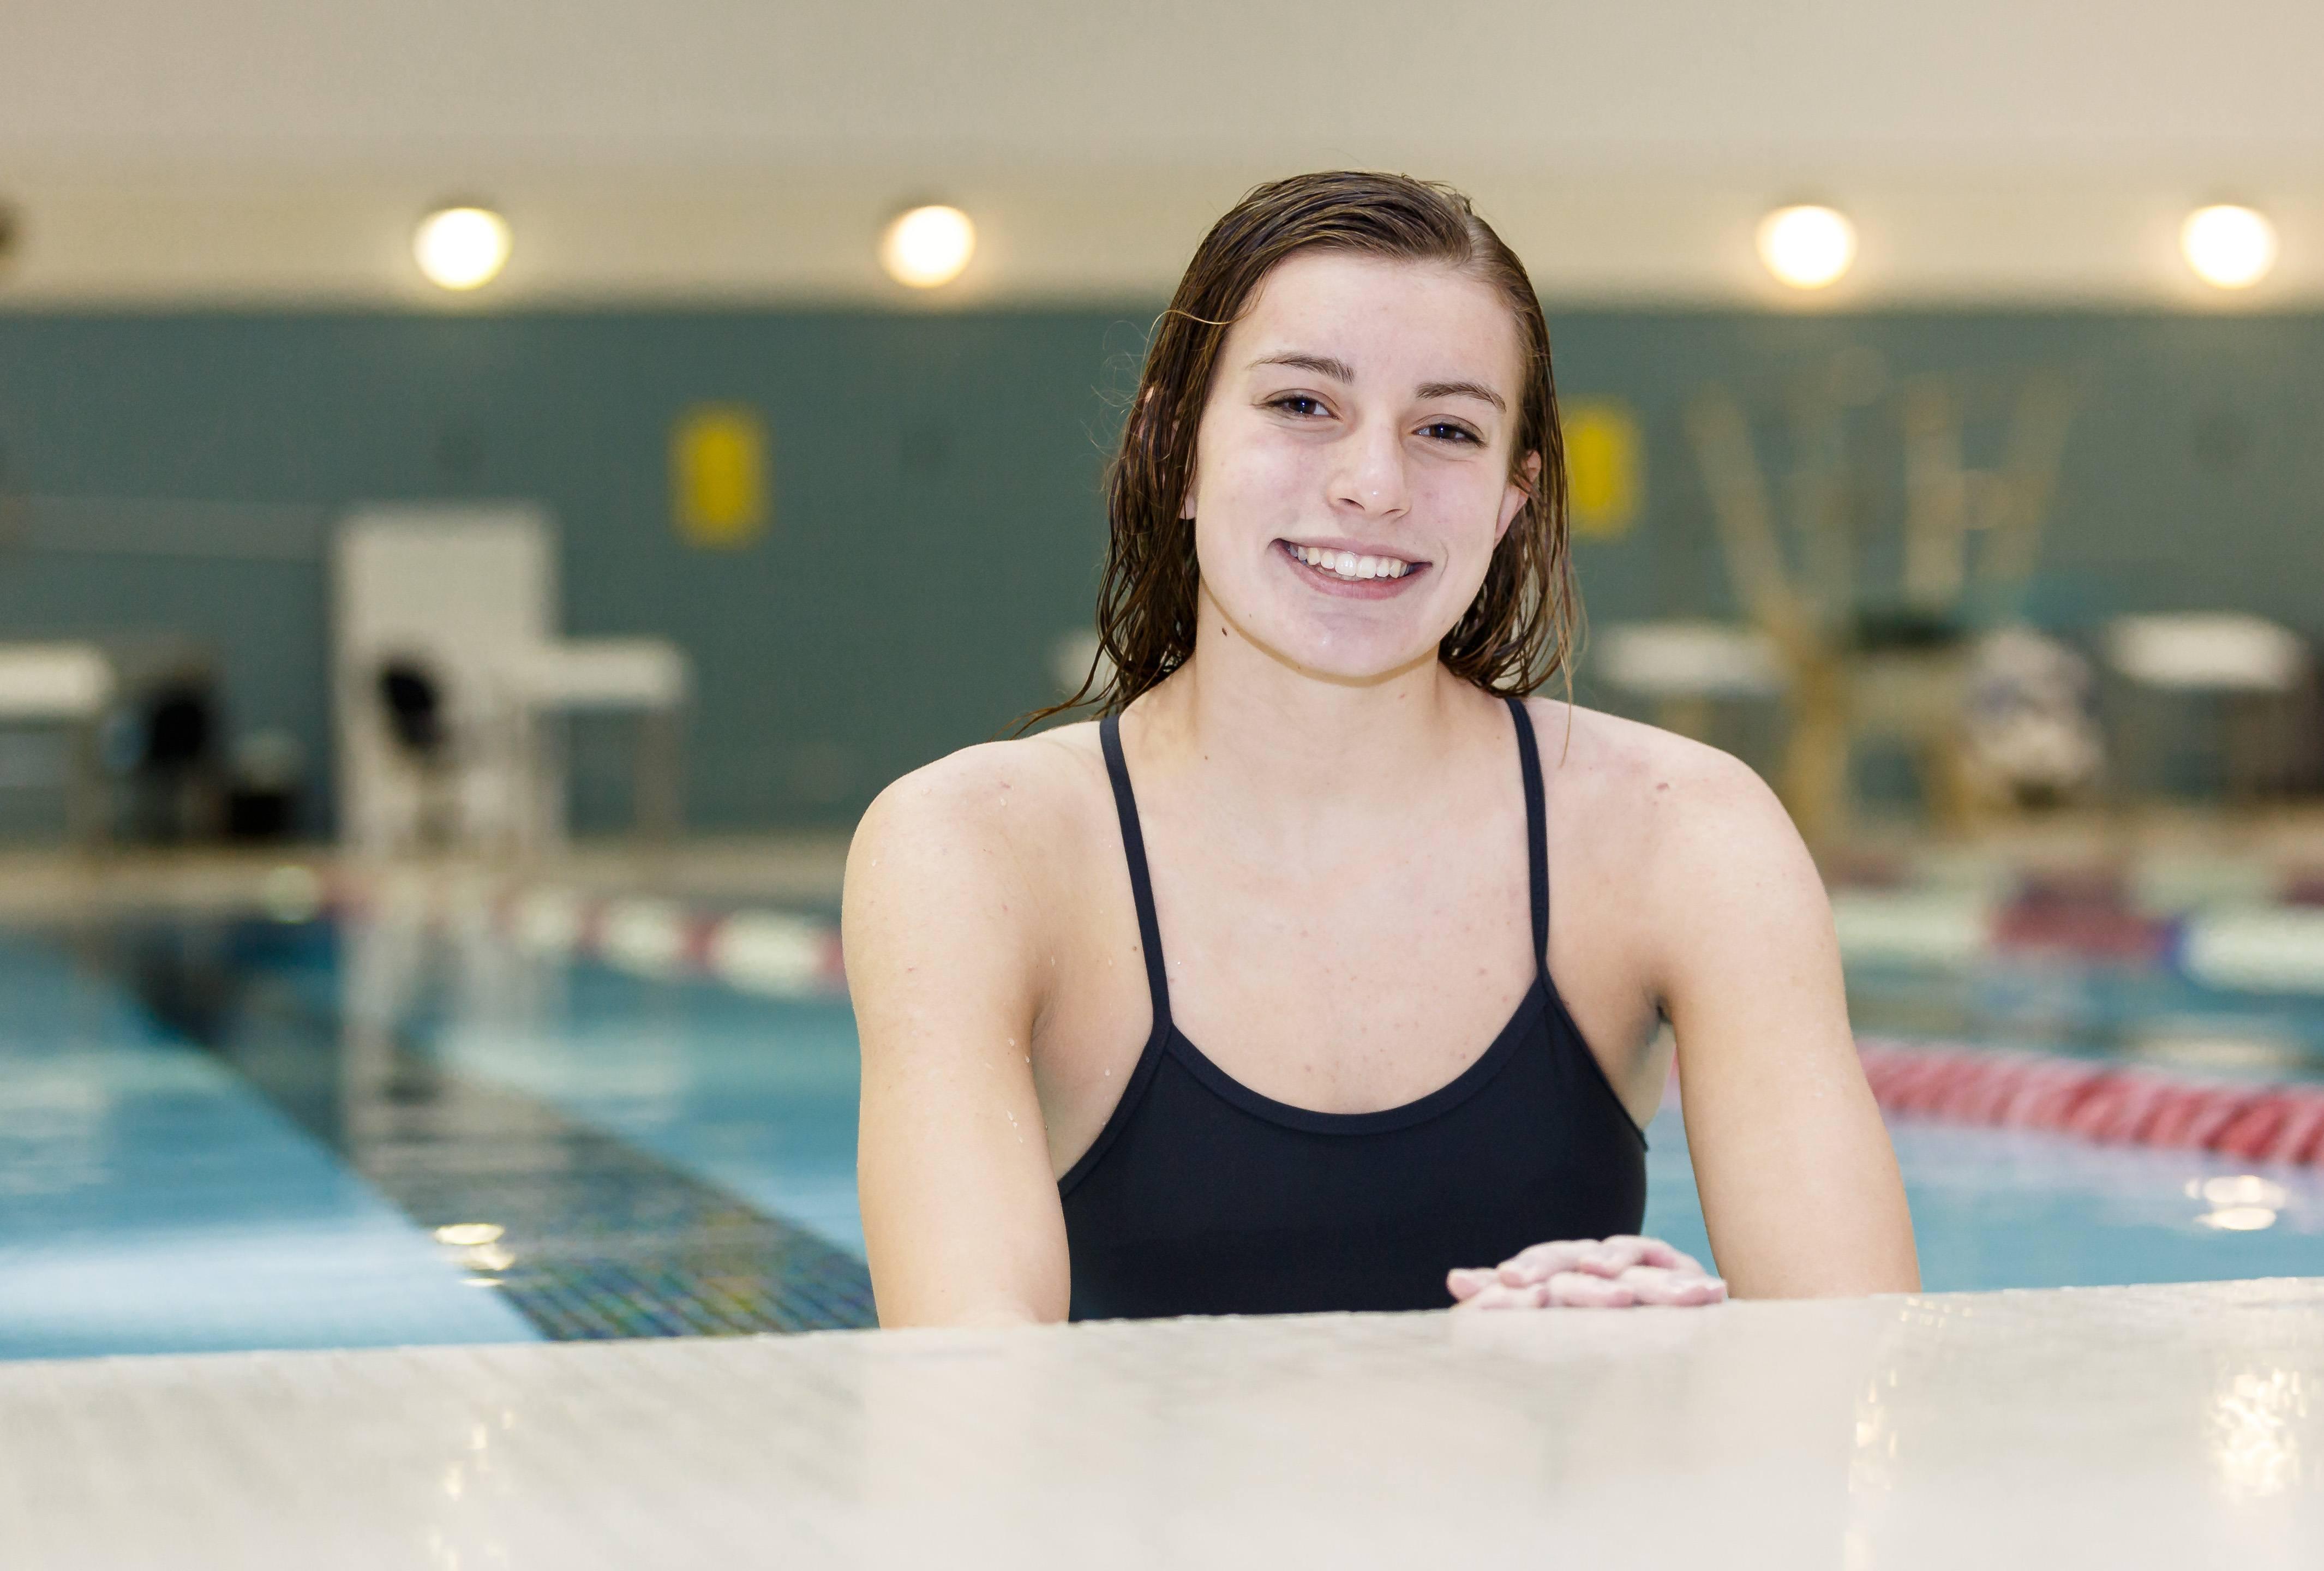 east swimmer leah westcott reaching her goals preps pros photo by alan herzberg sportsphotos llc